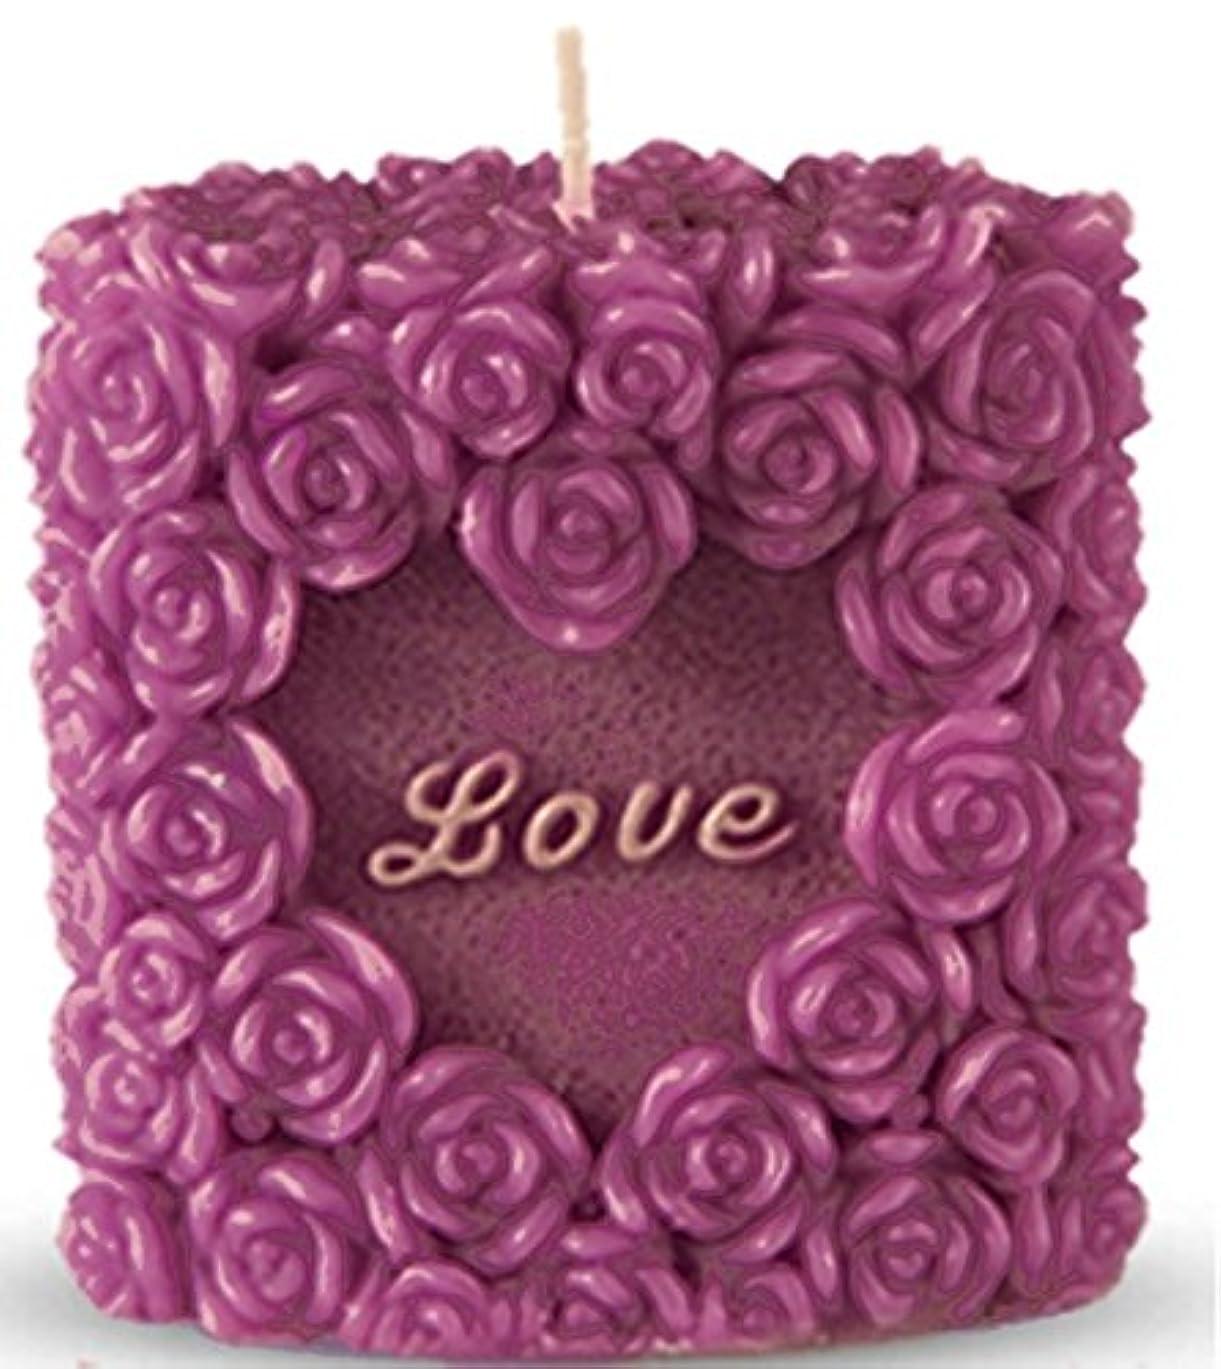 (Valentine Package) - Romantic Love Candle, Rose Design, Smokeless, Elegant, Non-Drip, Fragrant, Rosy and Premium...